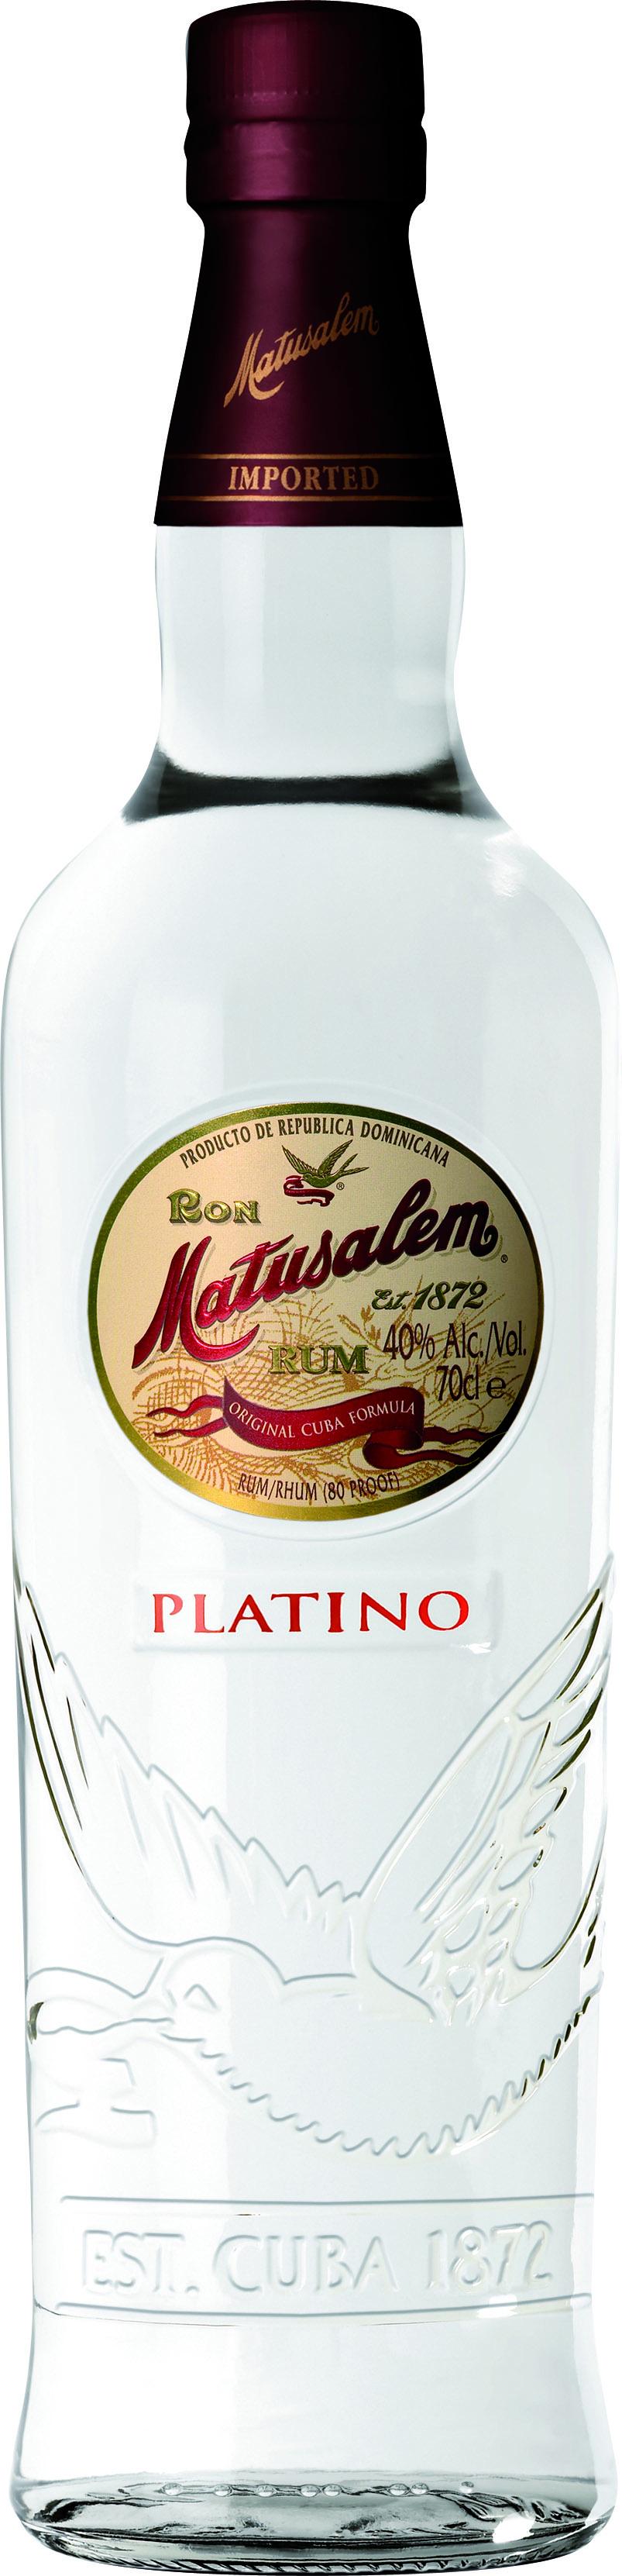 Ron Matusalem Rum Platino